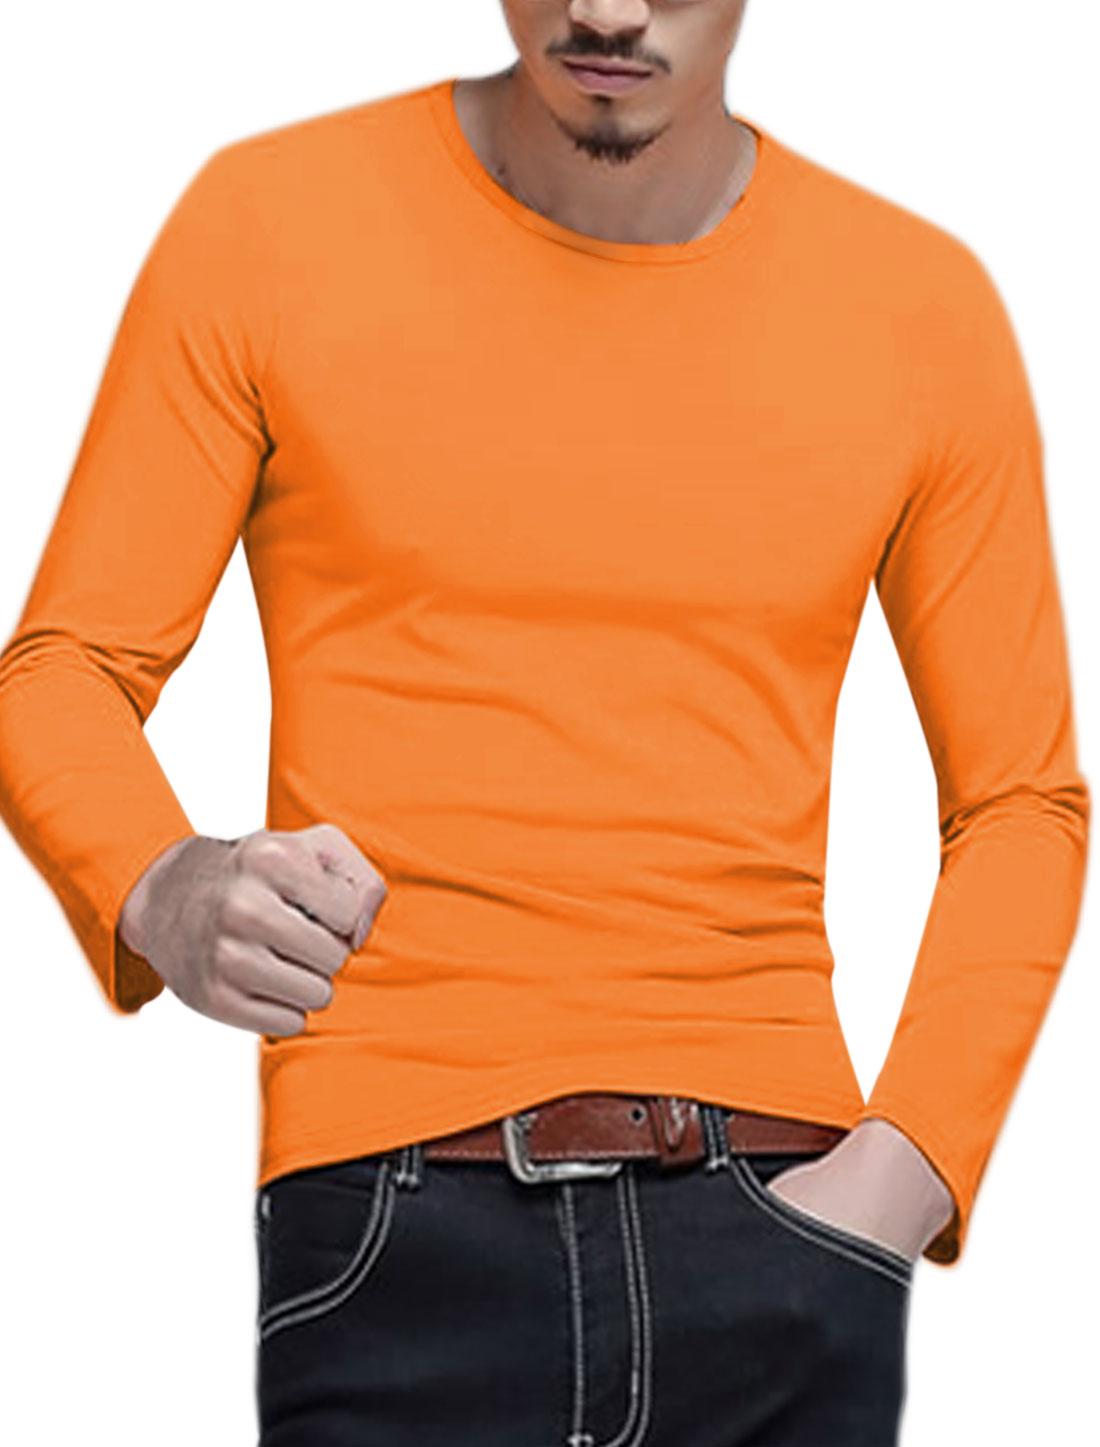 Men Long Sleeves Crew Neck Slim Fit Tee Shirt Orange S